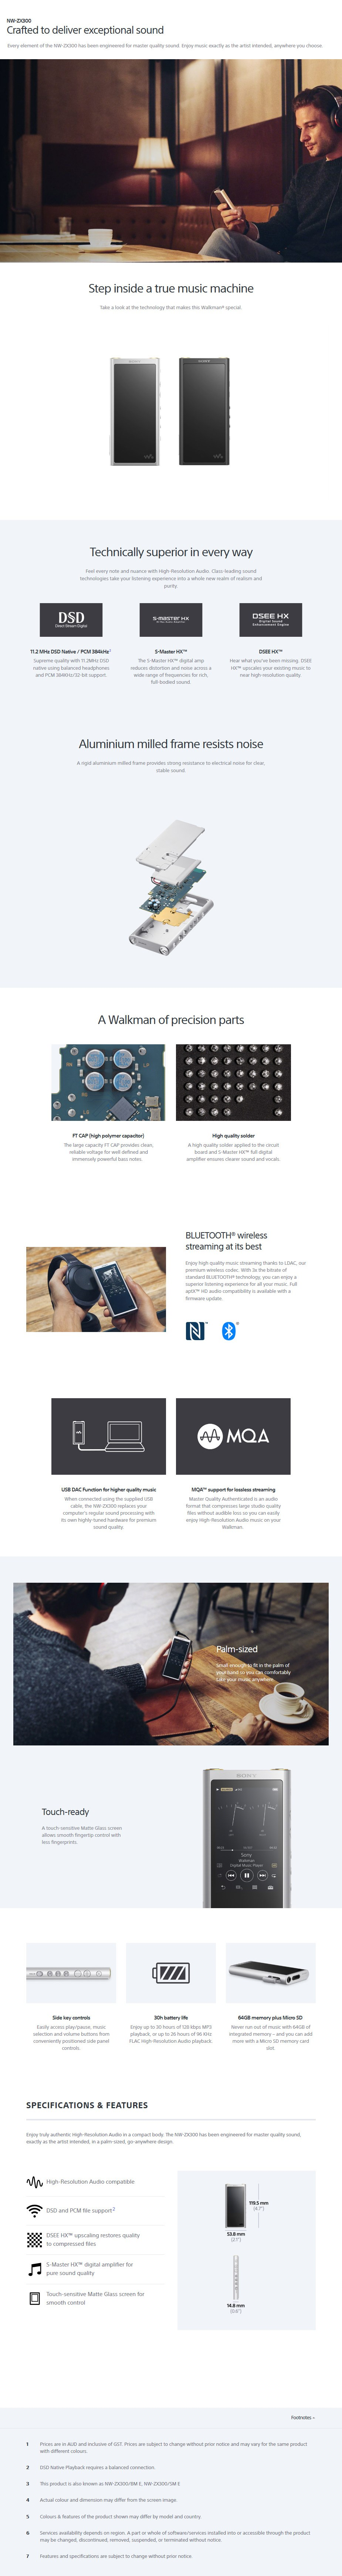 Sony ZX300 Walkman 64GB Portable MP3 Player - Black - Desktop Overview 1